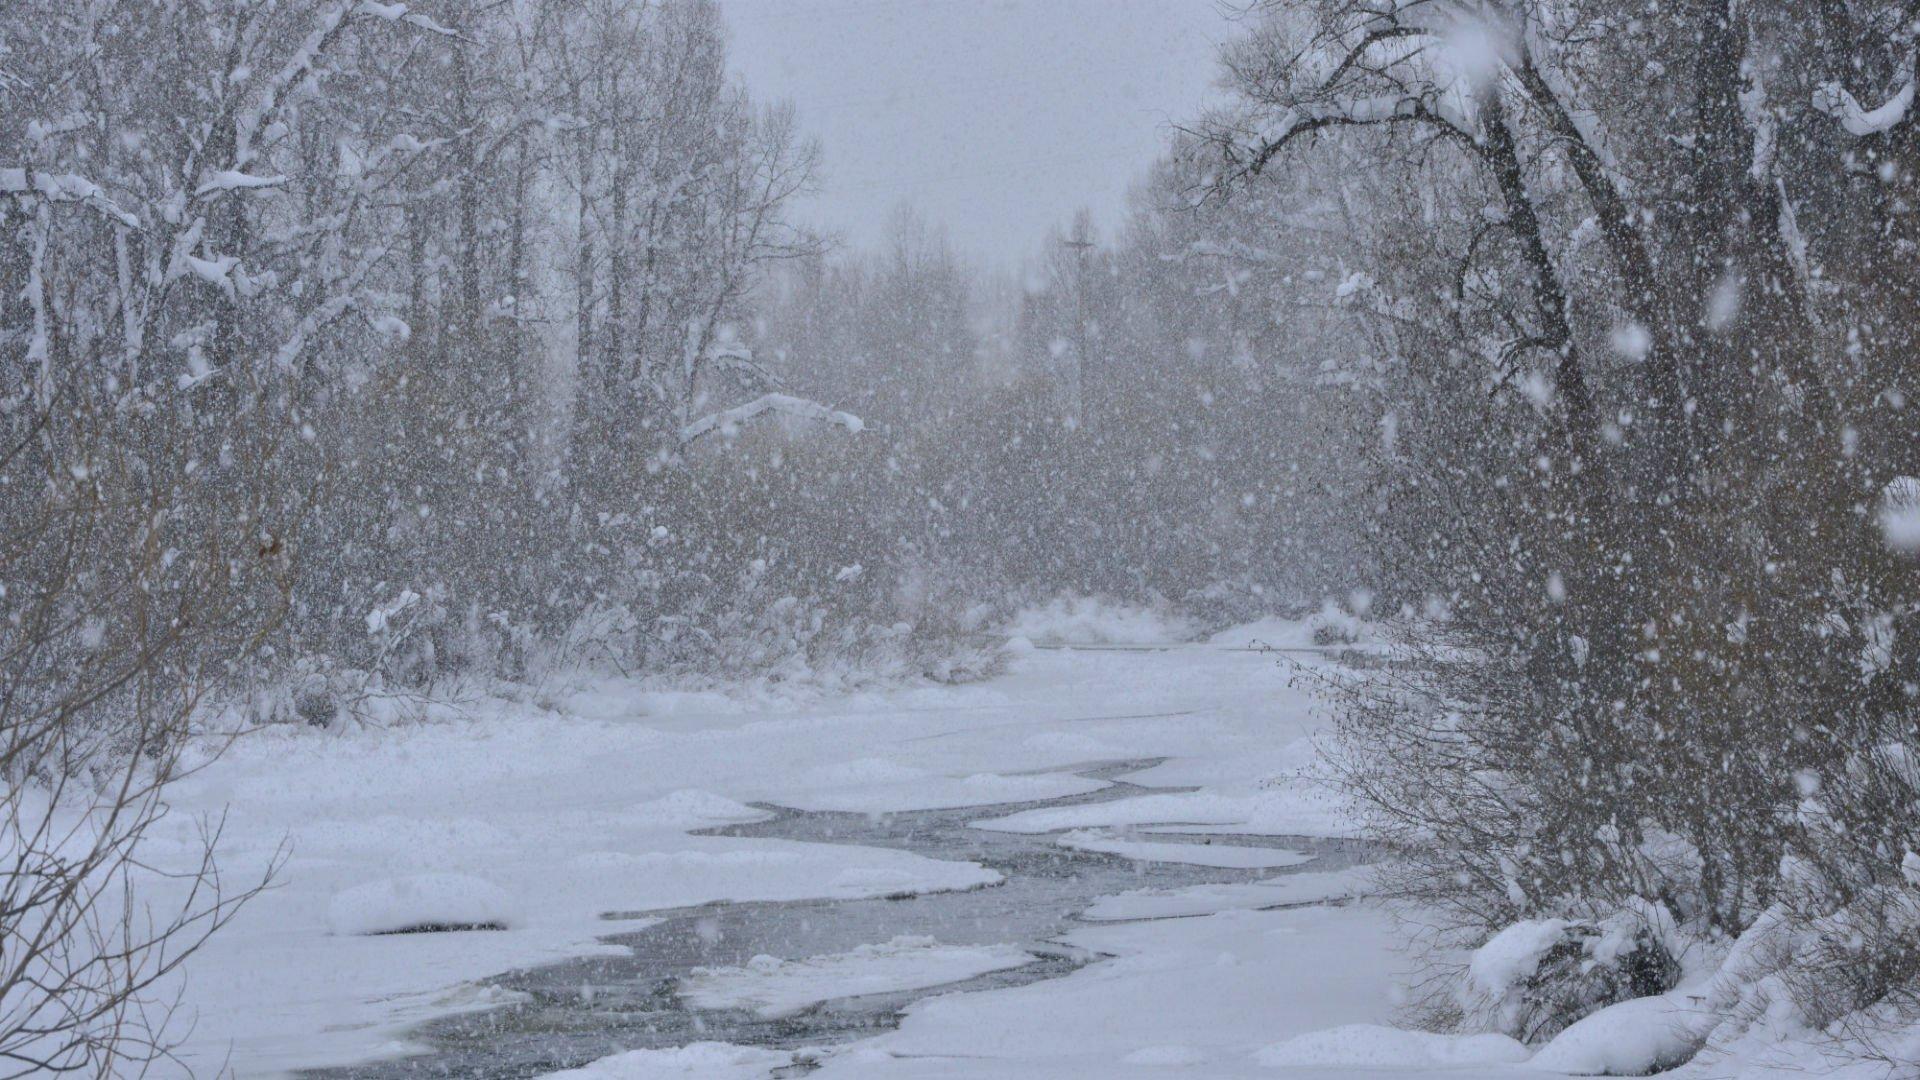 STORM weather rain sky clouds nature winter snow river ...